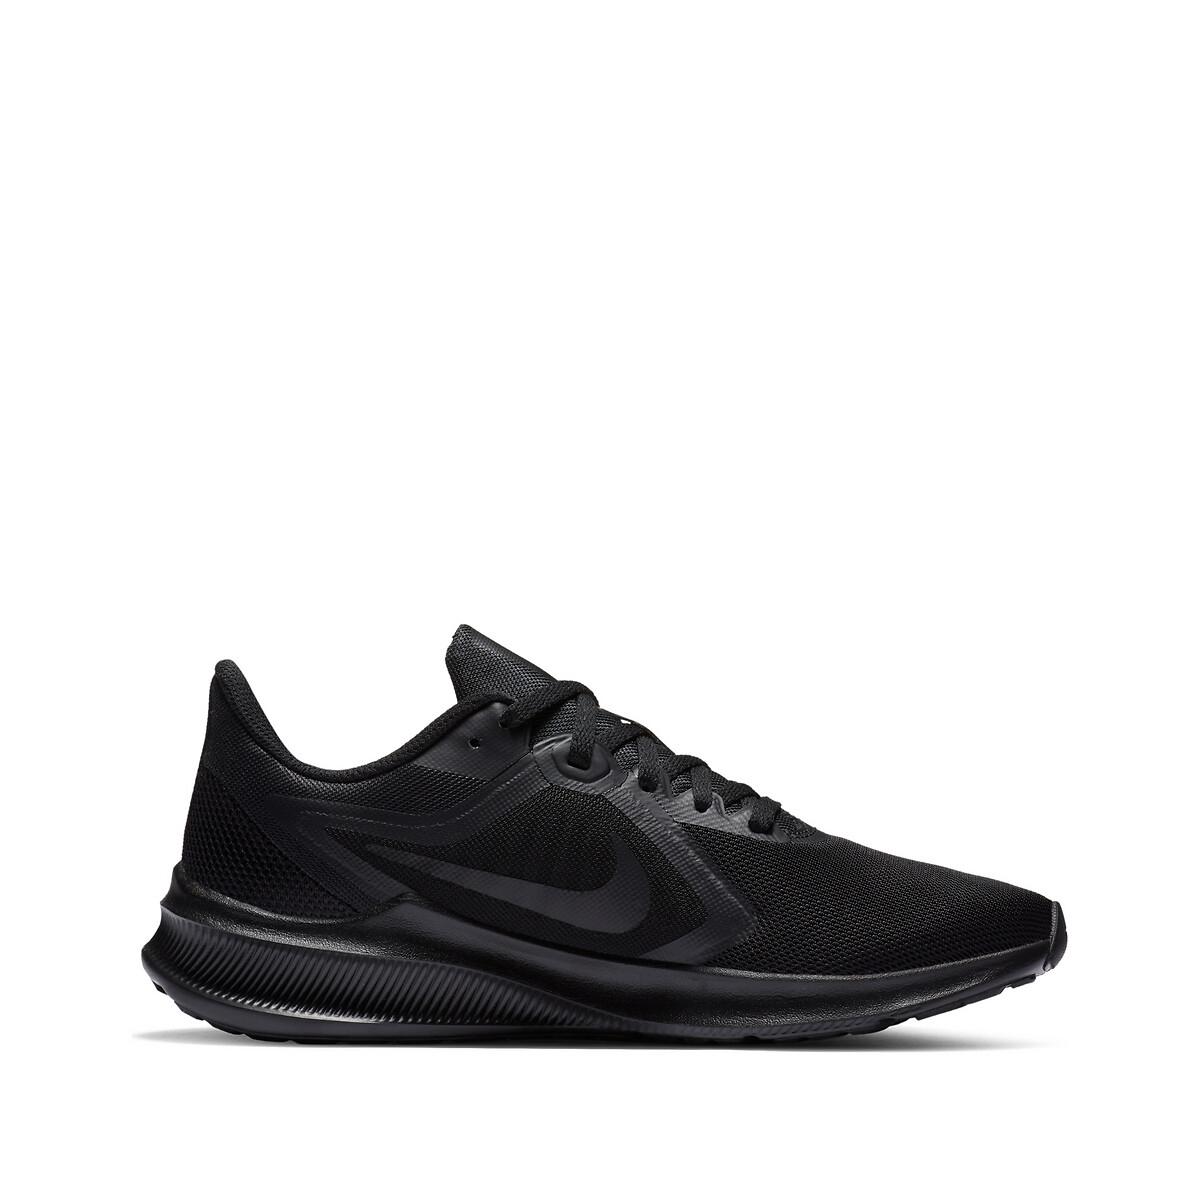 Nike downshifter 10 hardloopschoenen zwart dames online kopen